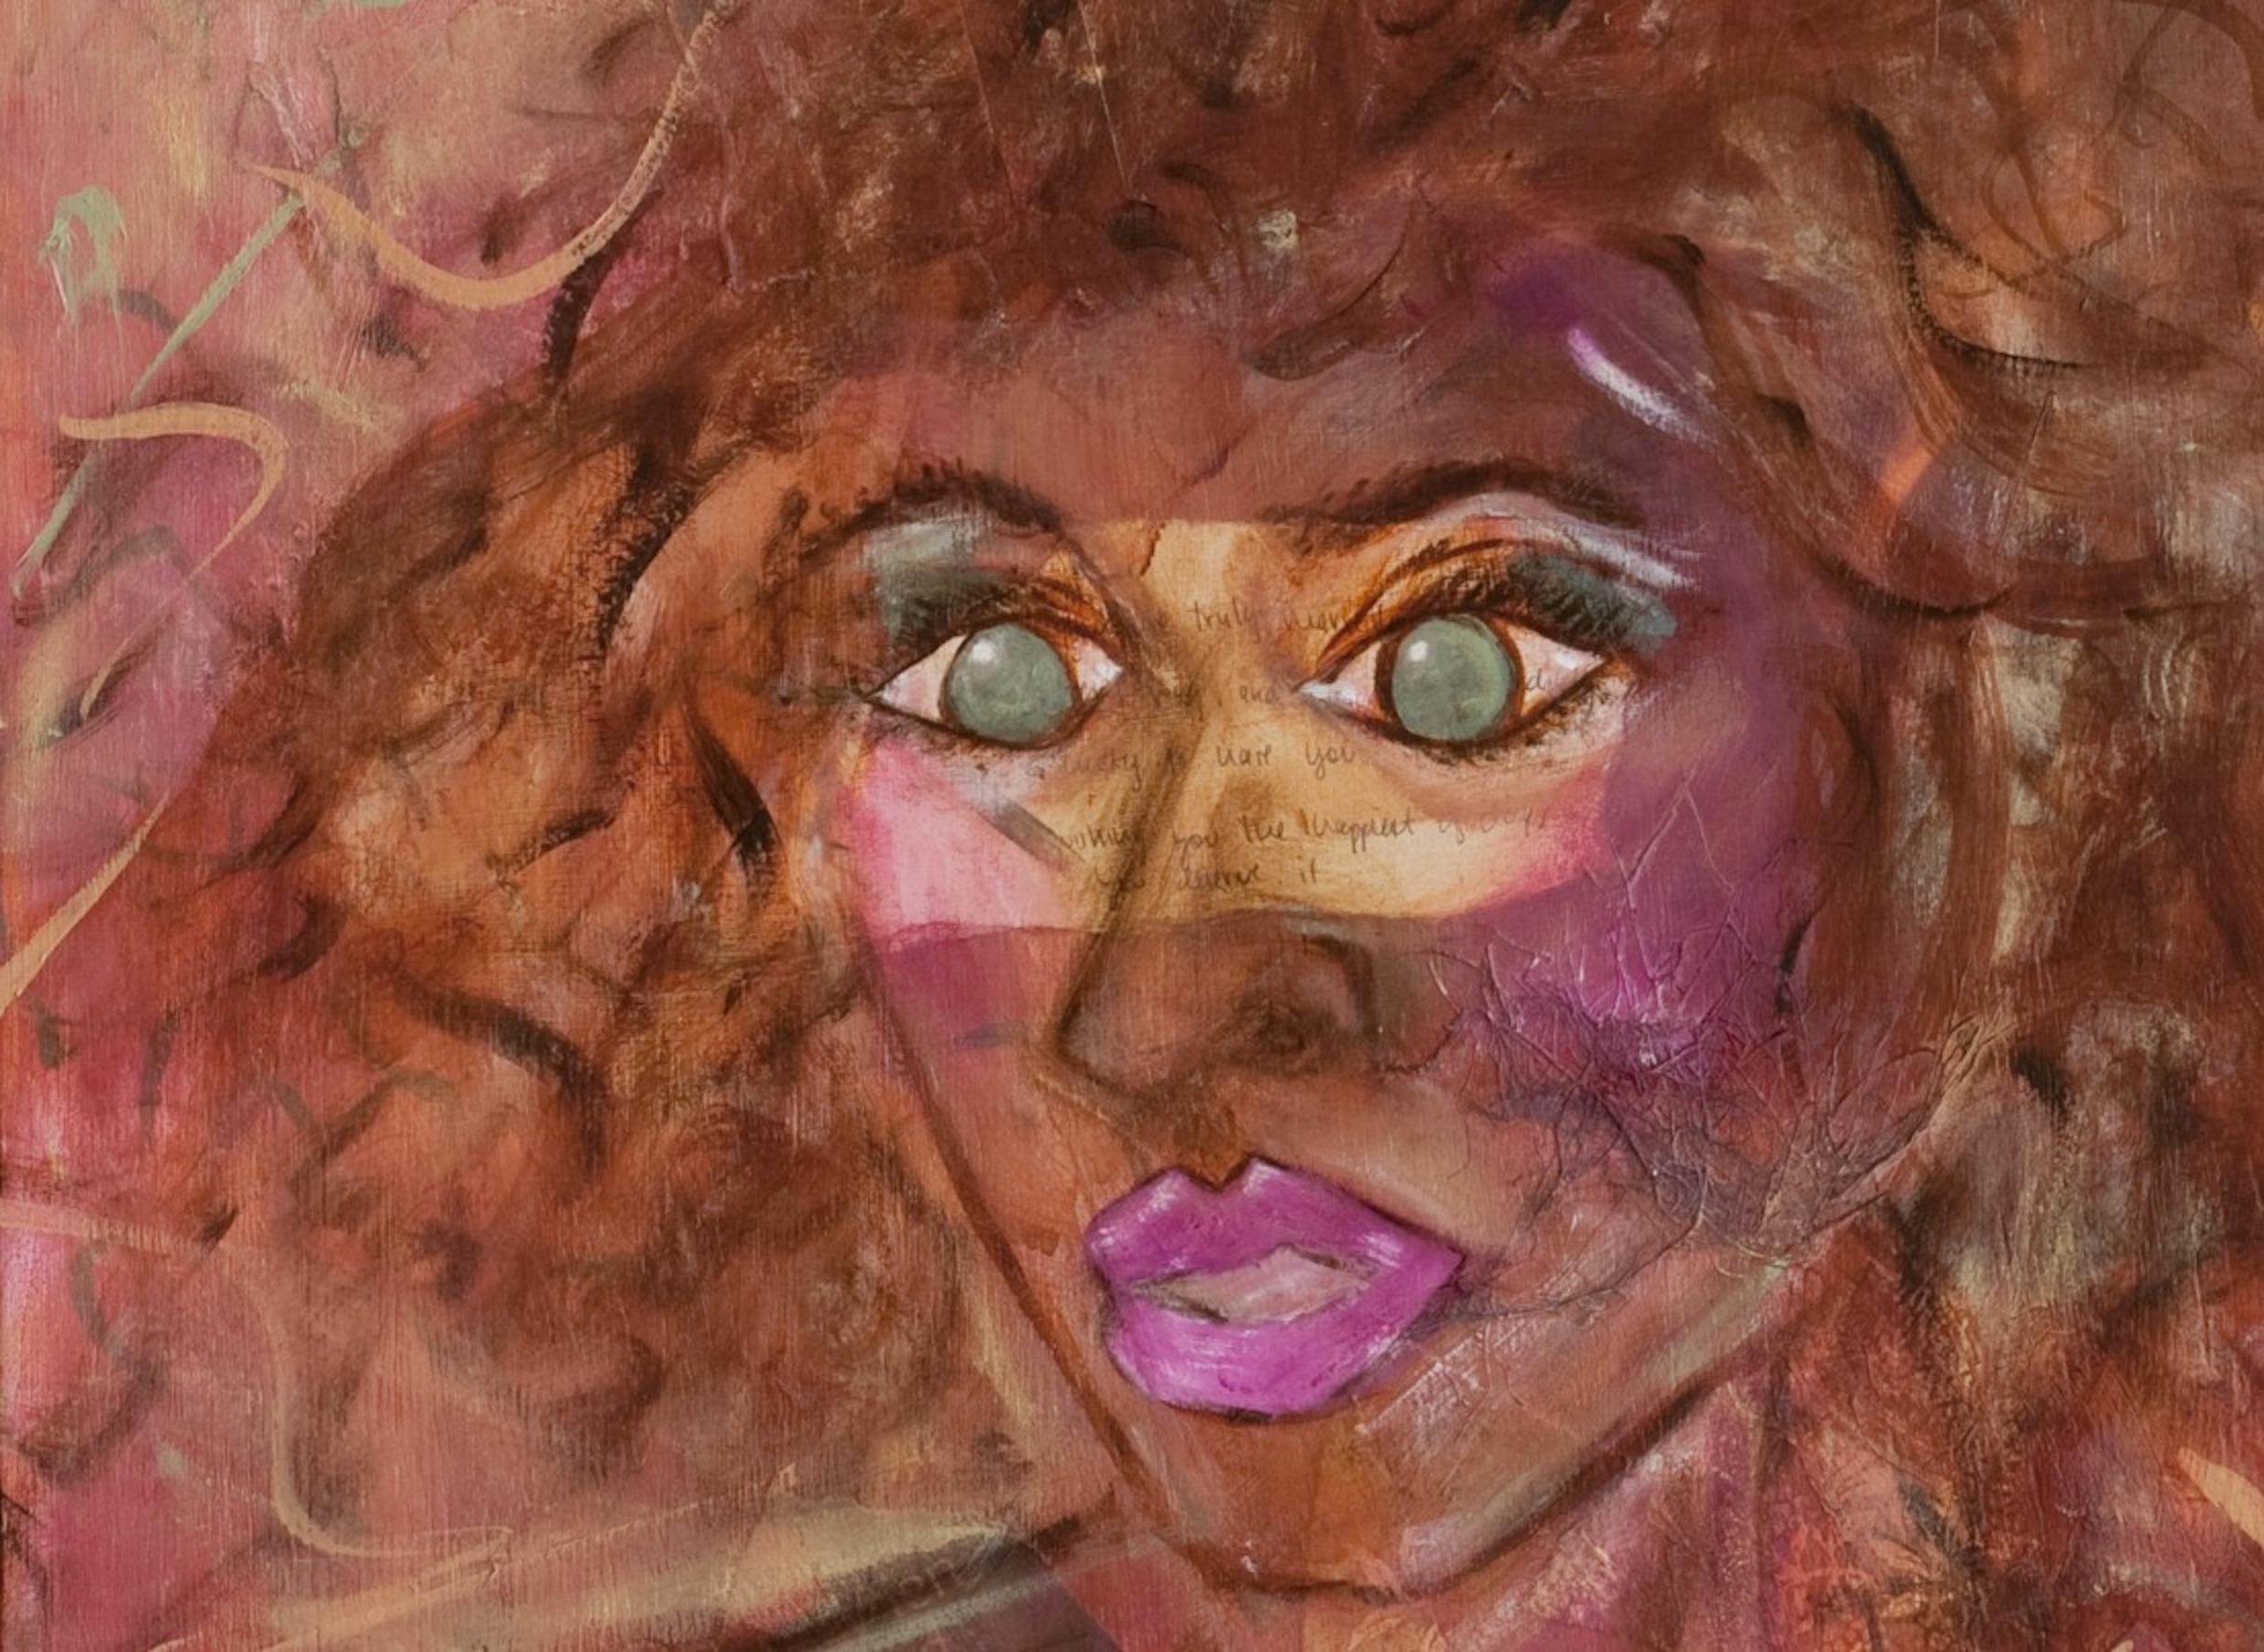 Jane's color image